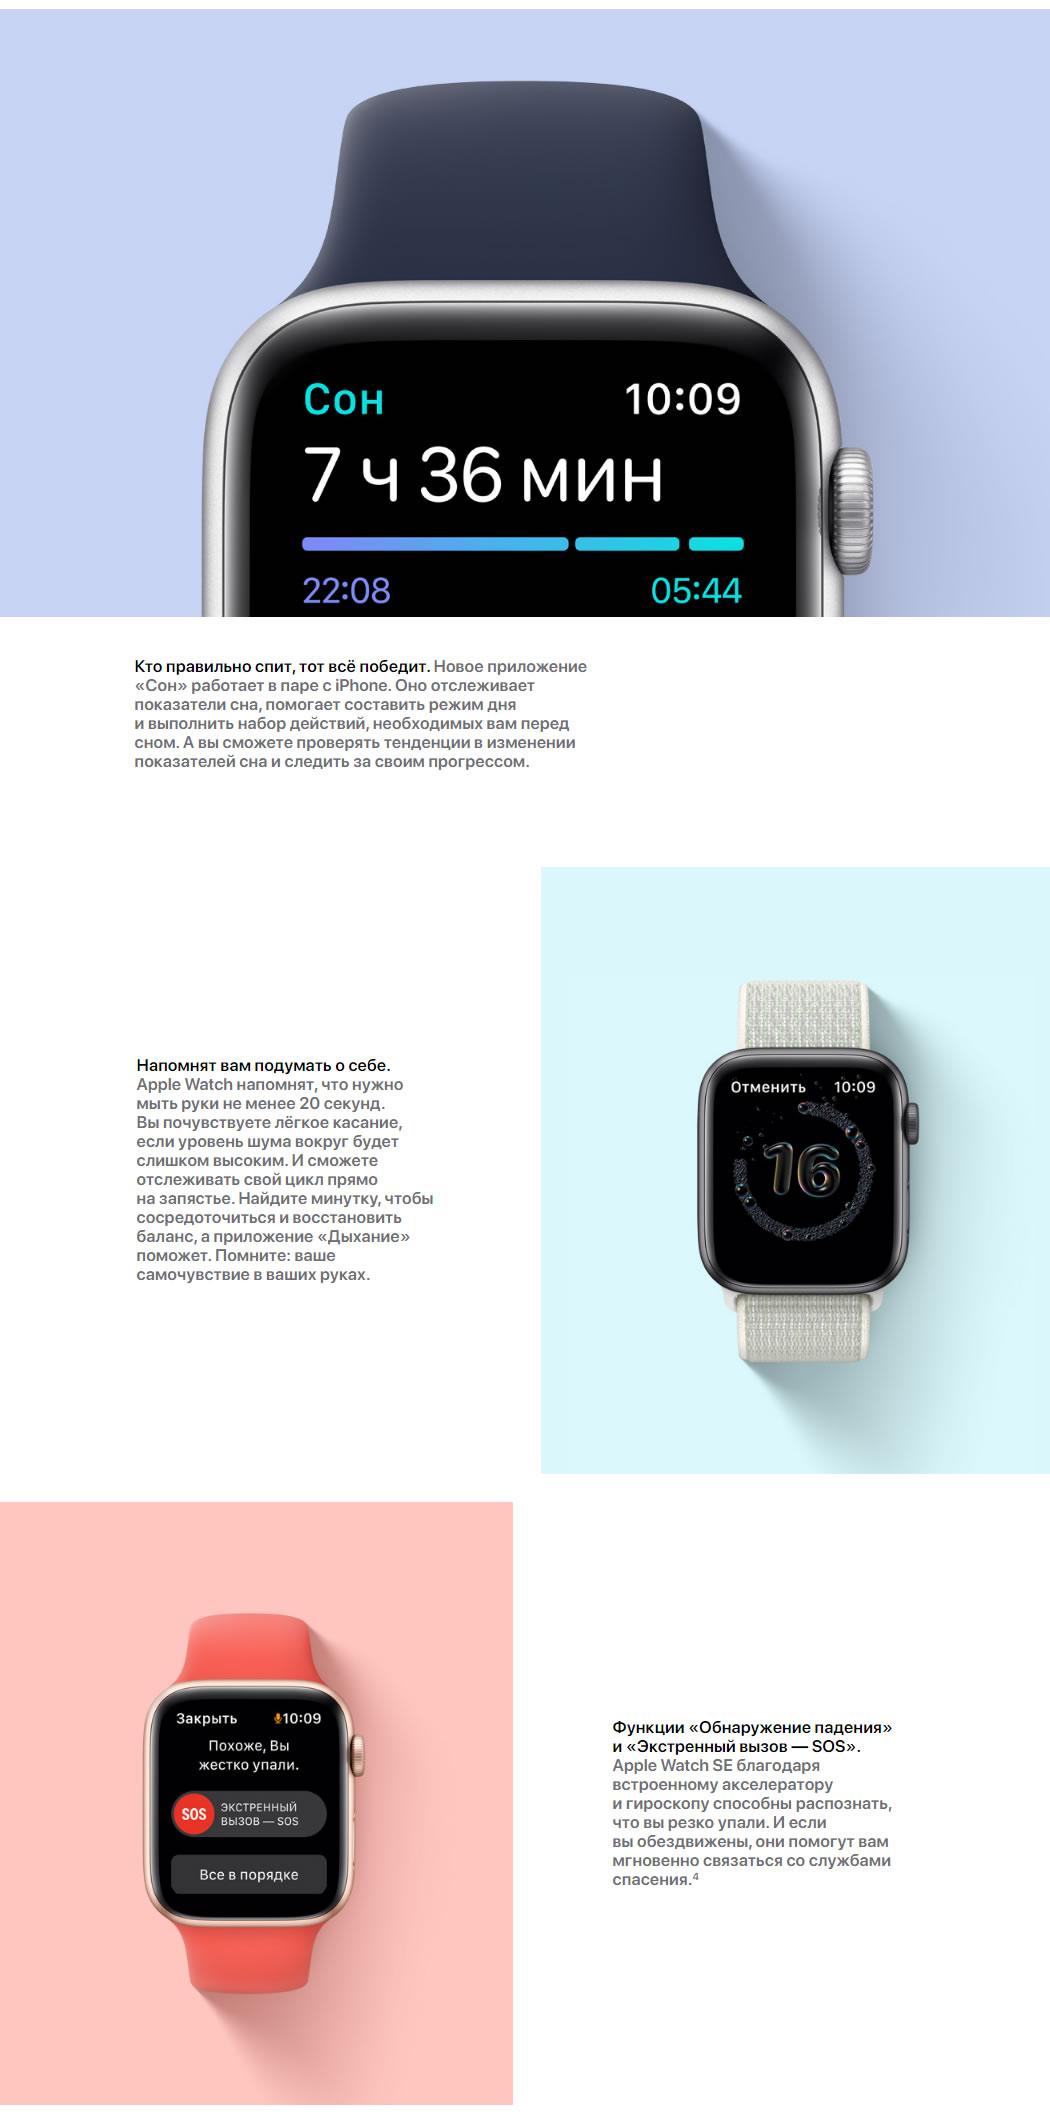 Apple Watch SE низкая цена